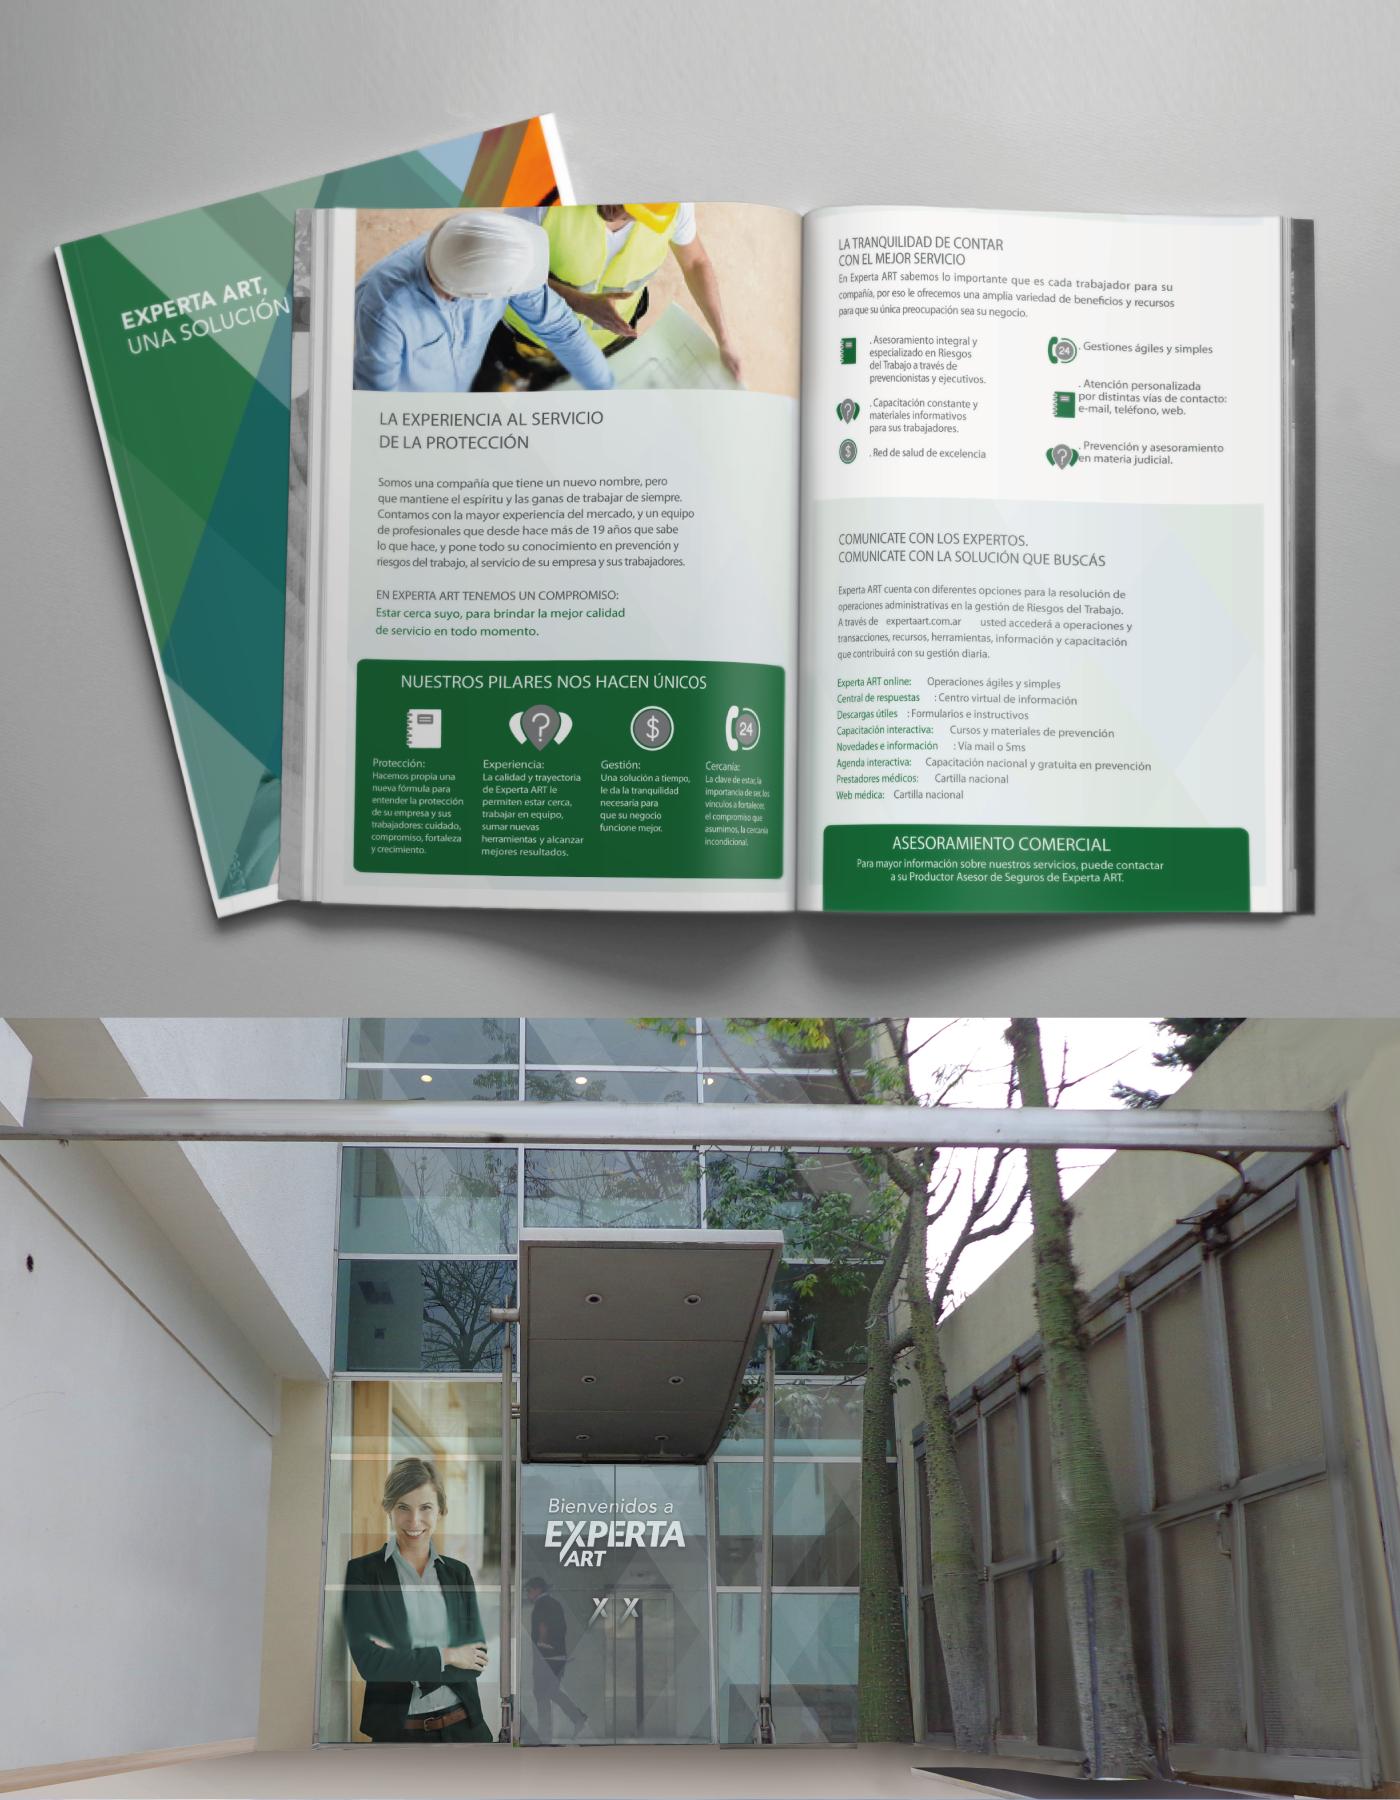 safety interior design  graphic design  visual identity marketing   work protection Creativity naming comunication branding